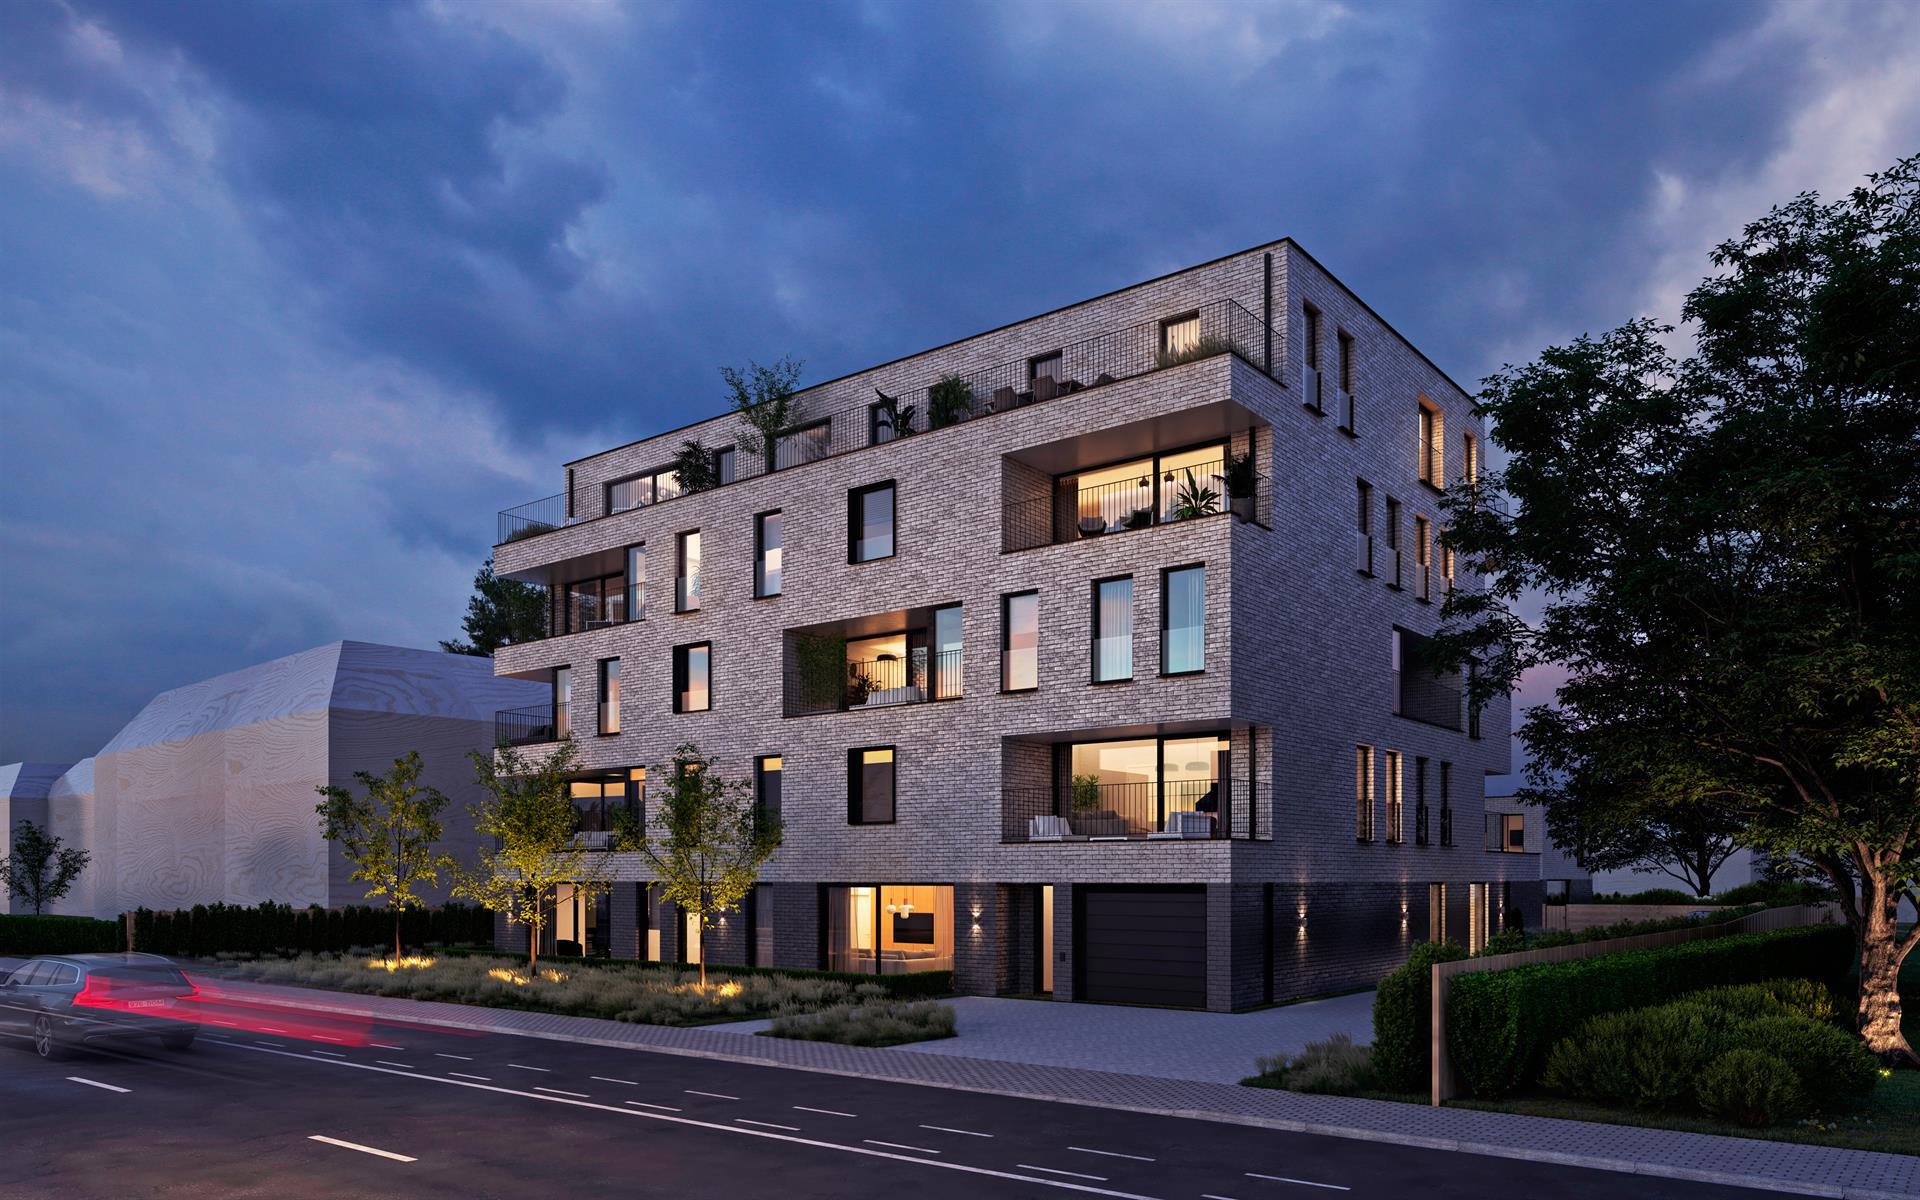 Appartement Te koop Gent Wondelgem Residentie Evergreenpark - Evergemsesteenweg - Wondelgem (Gent)